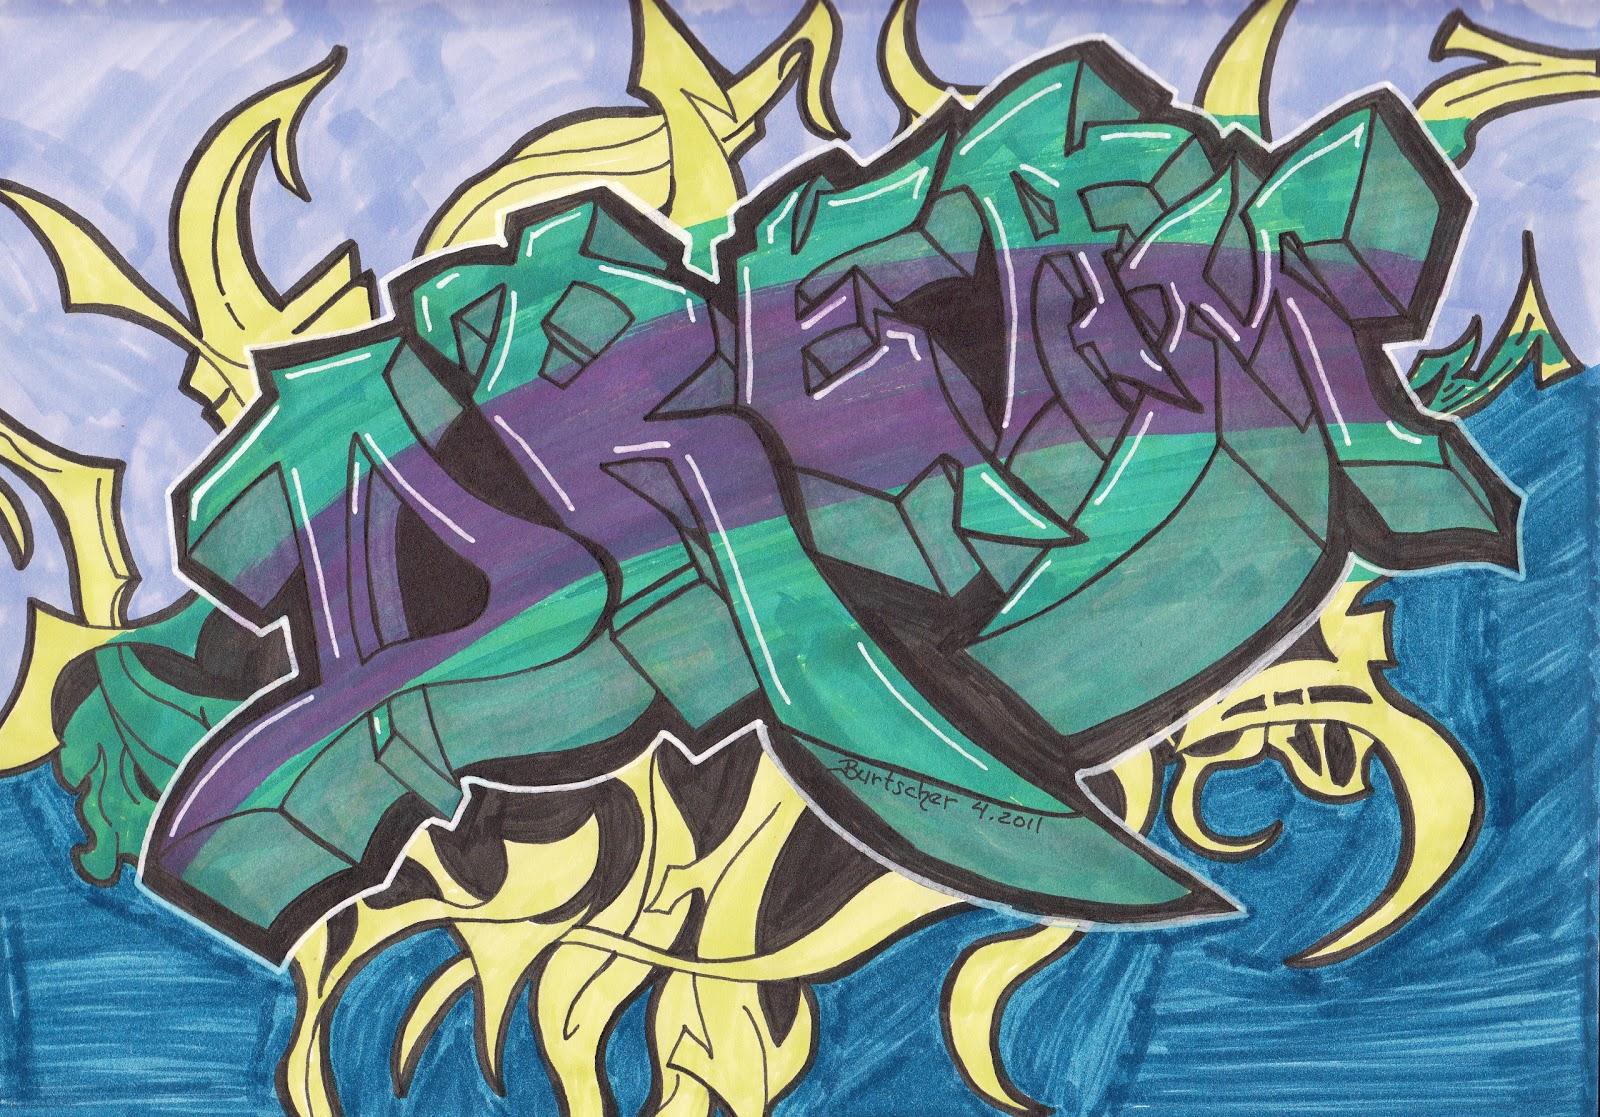 Drawn randome graffiti Themes The drawings) in around